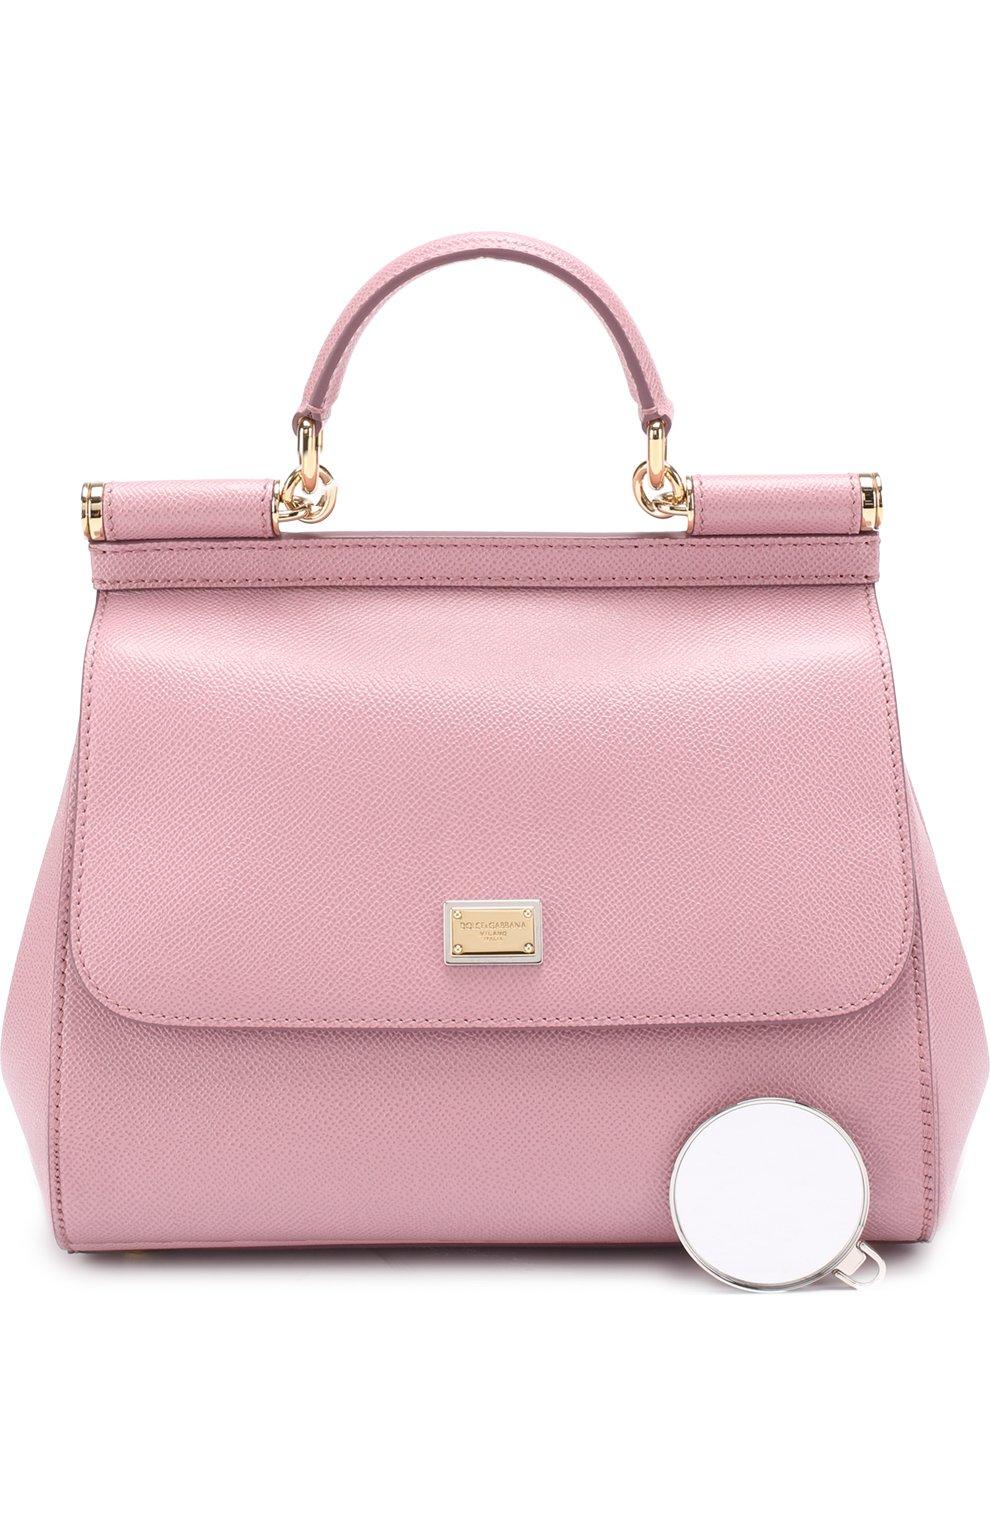 Сумка Sicily medium Dolce & Gabbana розовая цвета | Фото №6